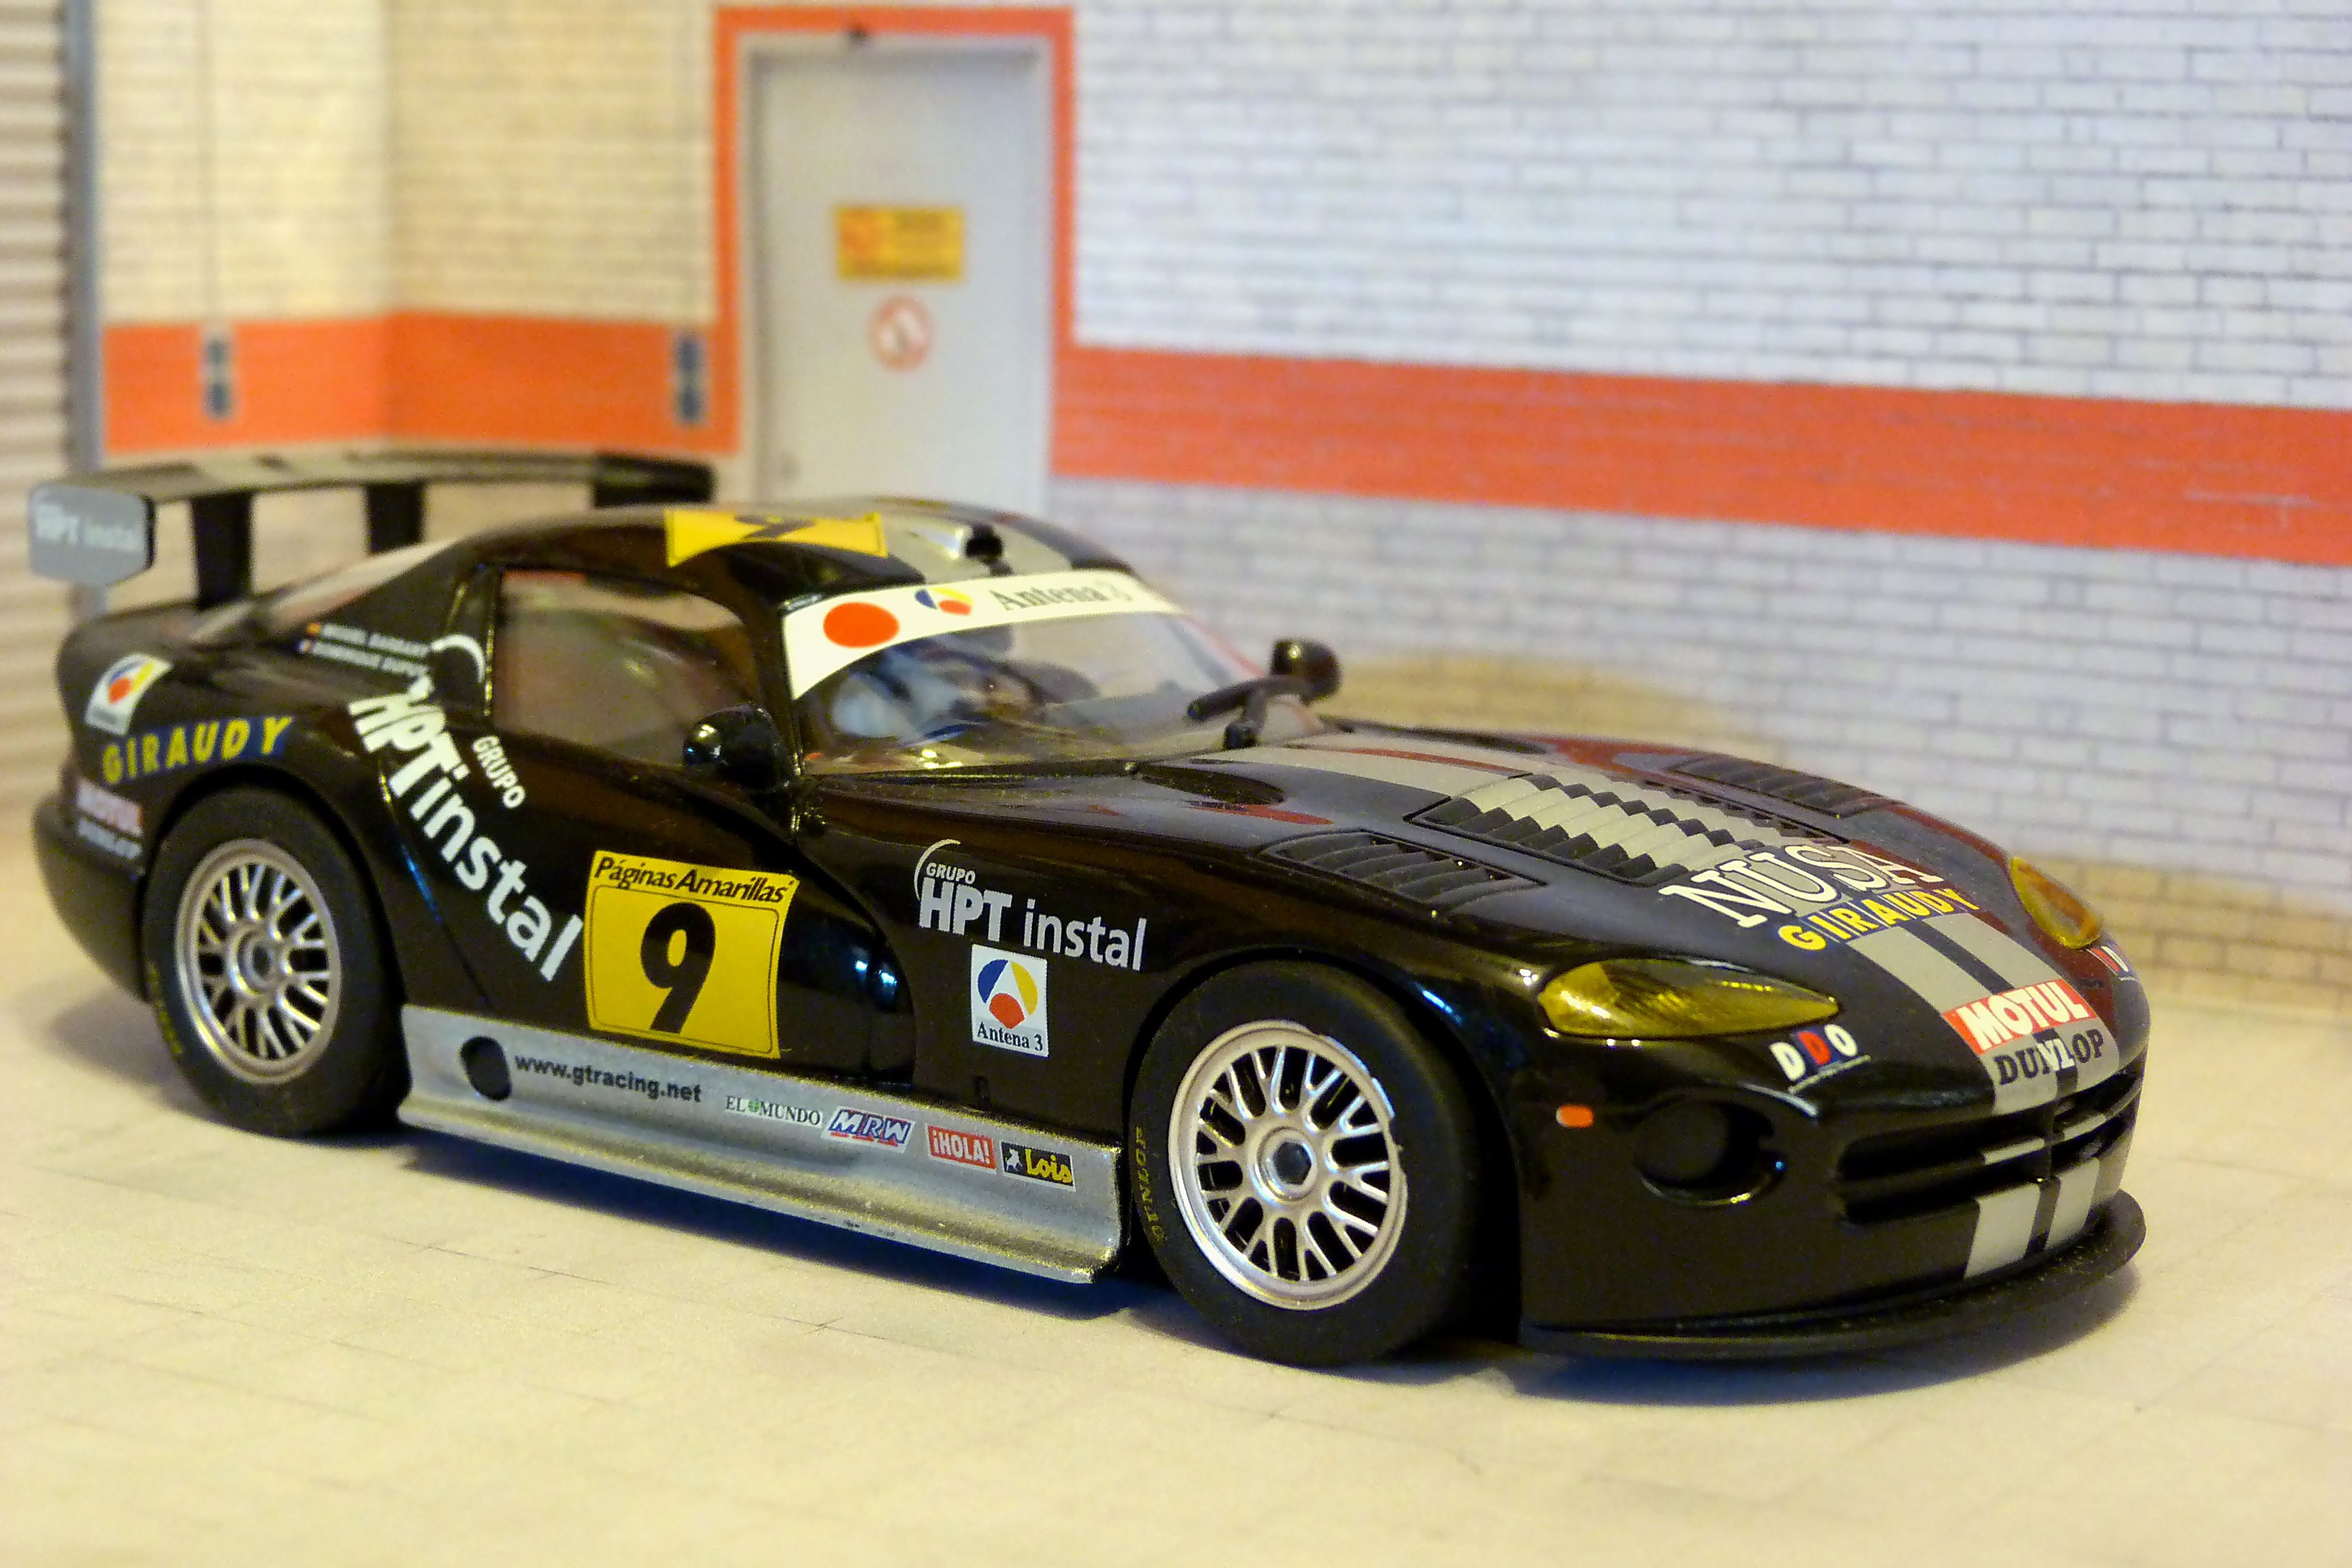 Scale Speed Raceway York Pa Lazy 8 Slot Racing Slot Cars Car Model